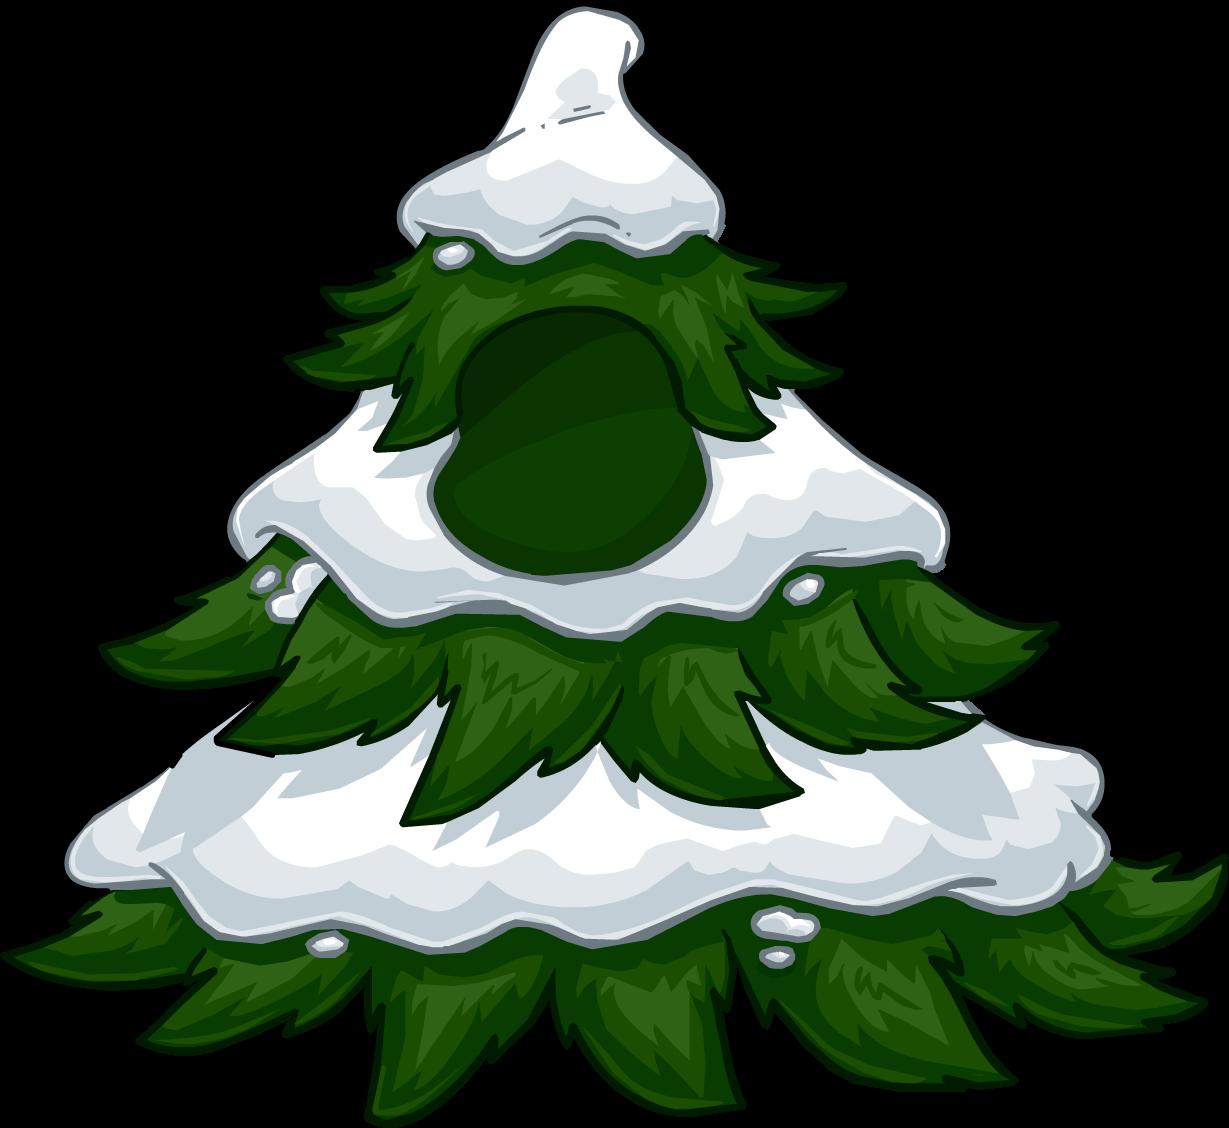 tree costume club penguin wiki fandom powered by wikia - Christmas Tree Costume